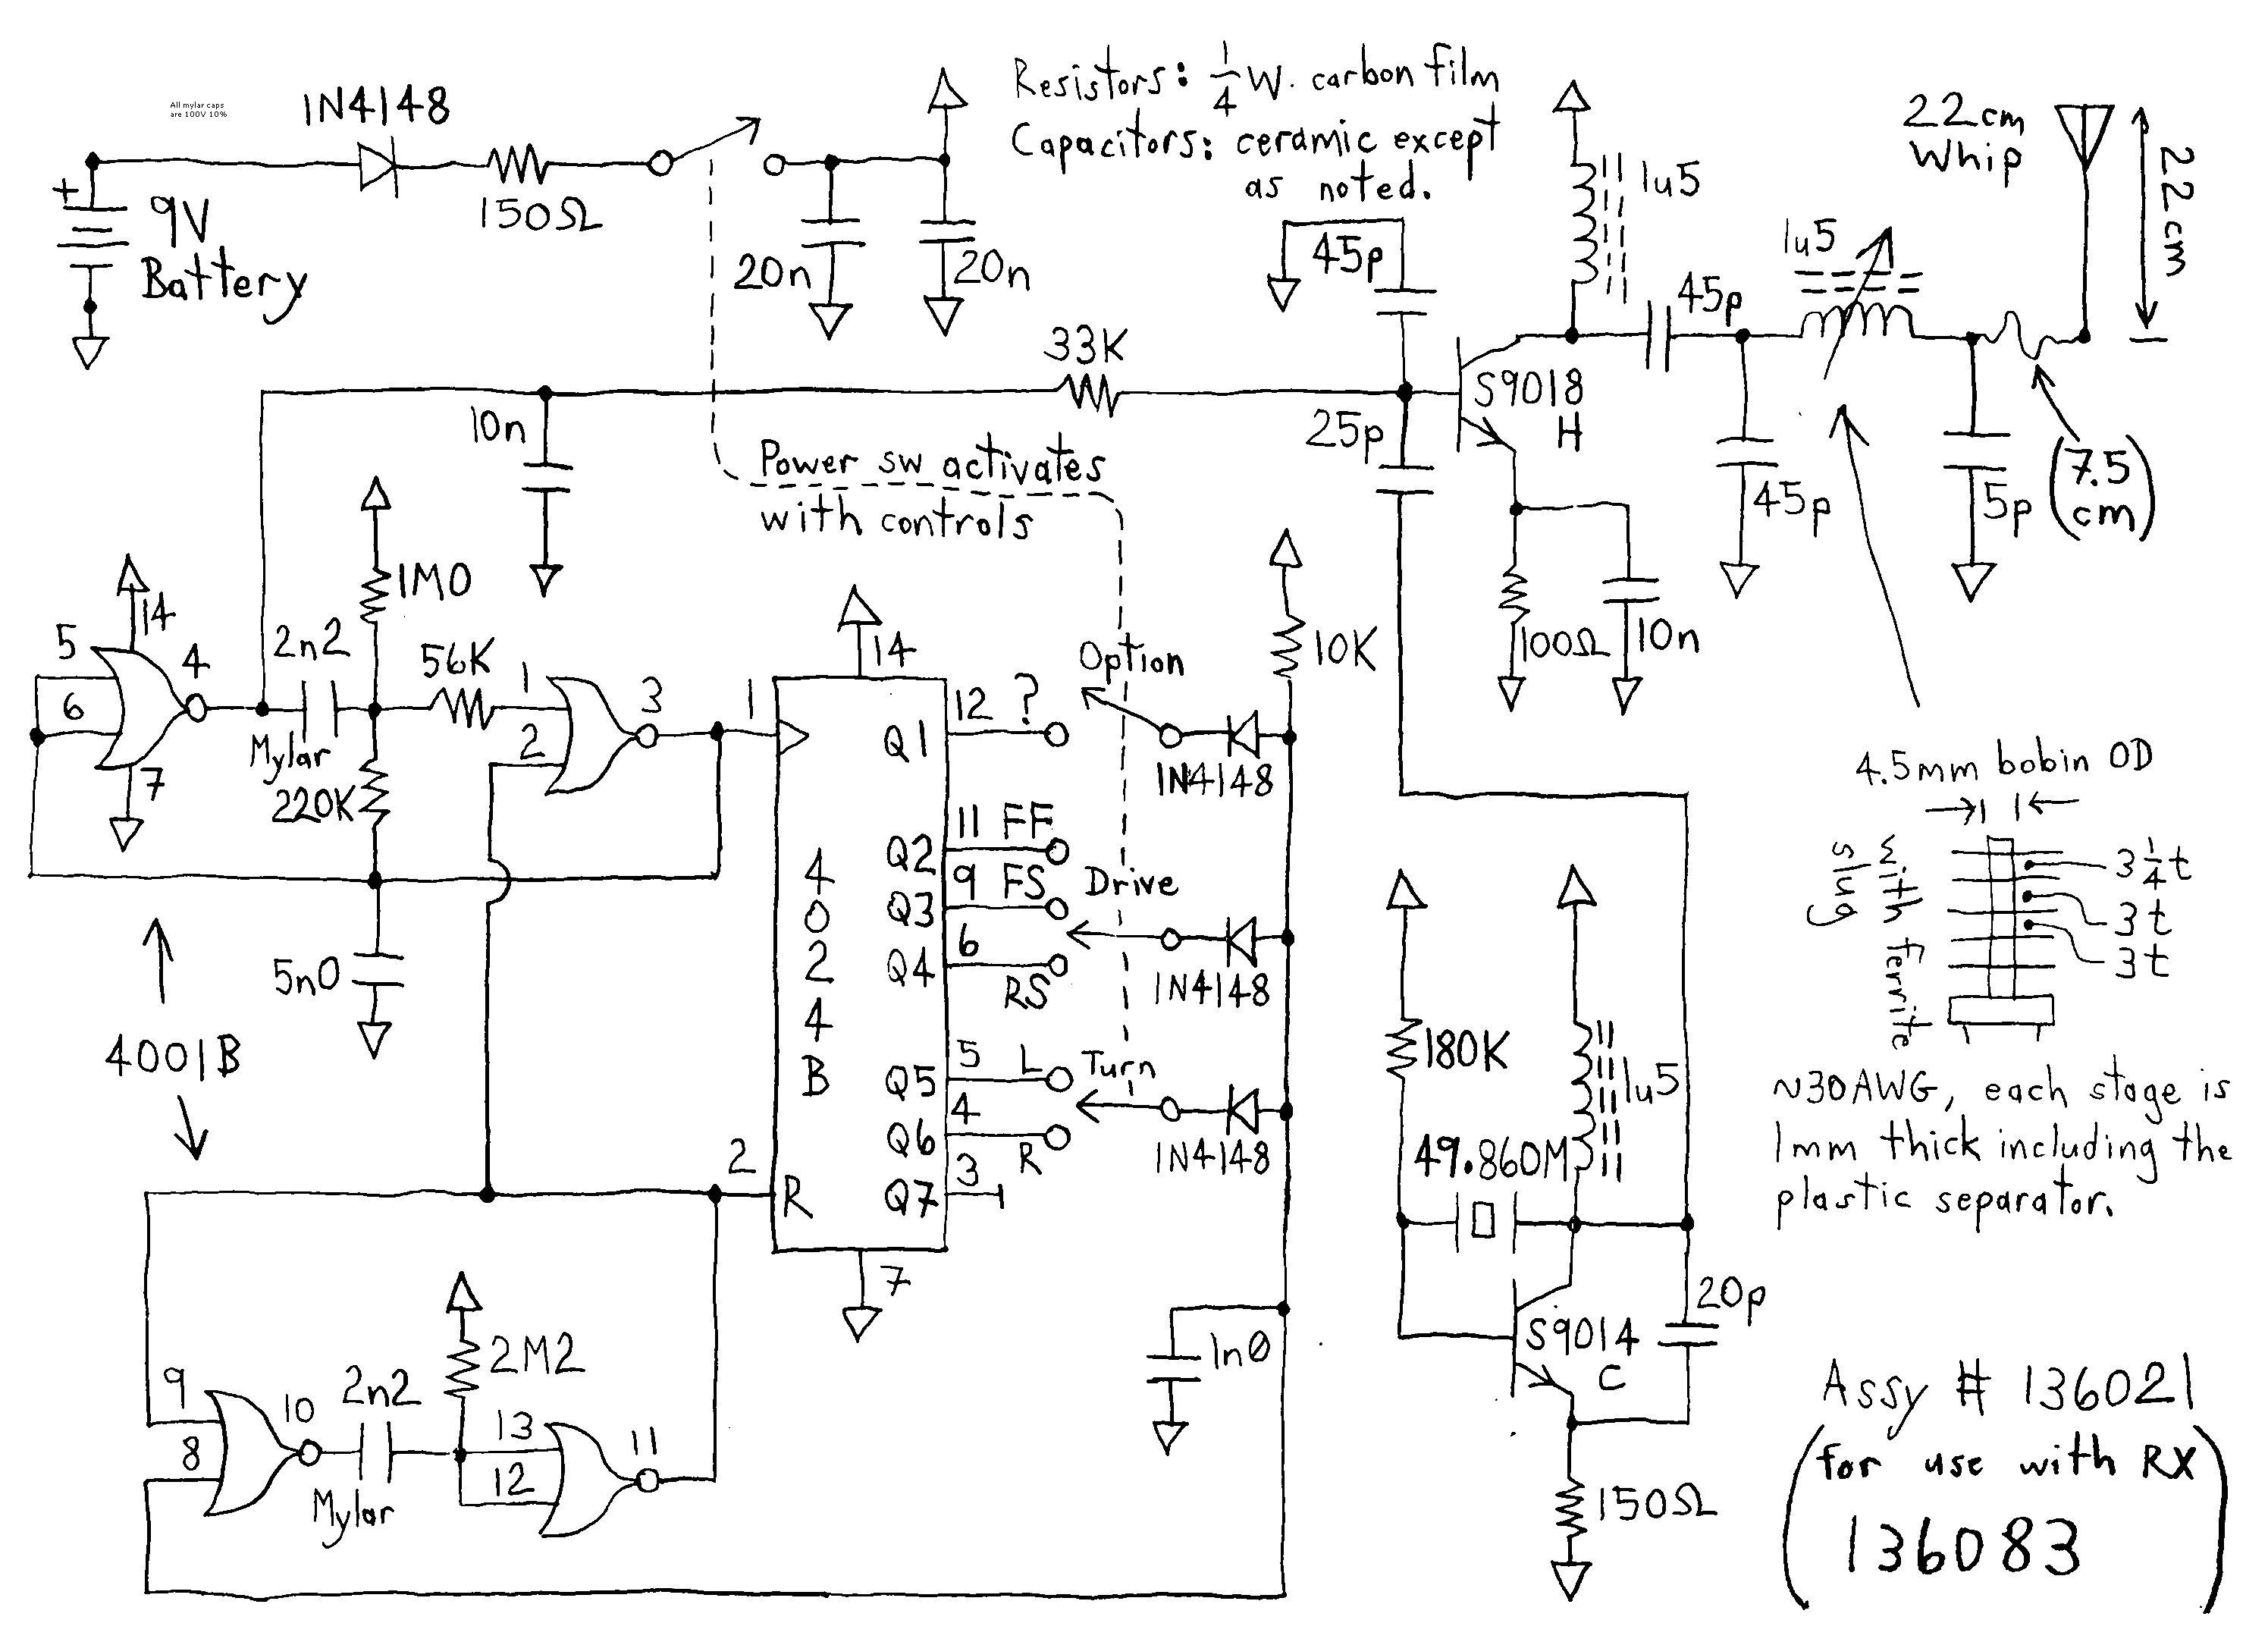 Electric Motor Wiring Diagram Electric Motor Wiring Diagram Symbols Fresh Wire Diagram Symbols Of Electric Motor Wiring Diagram